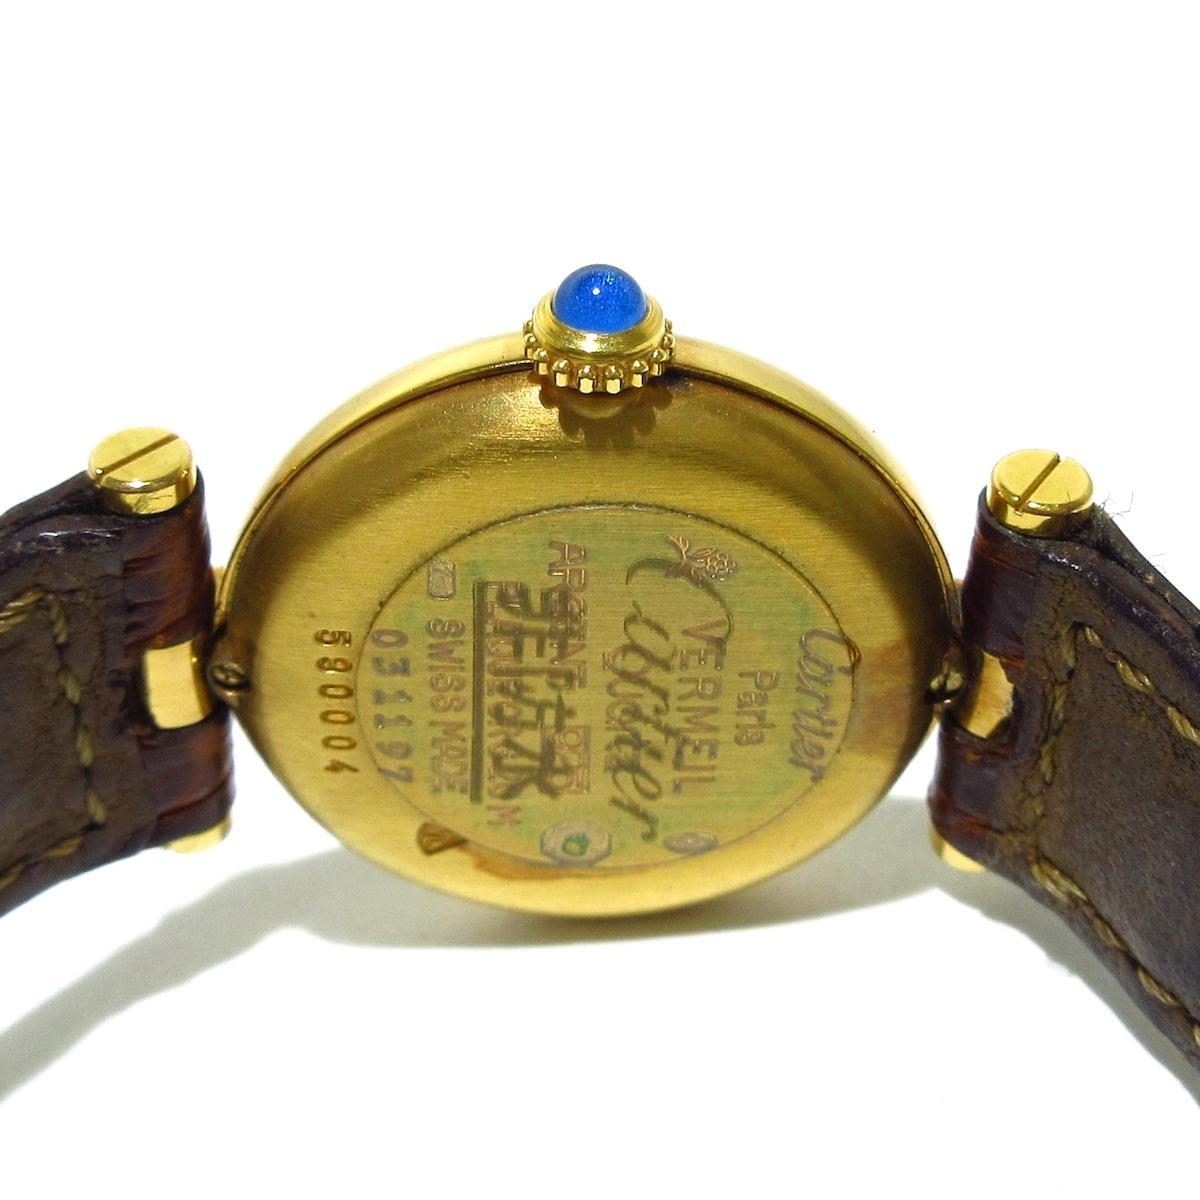 Cartier(カルティエ)のマストヴァンドームヴェルメイユ